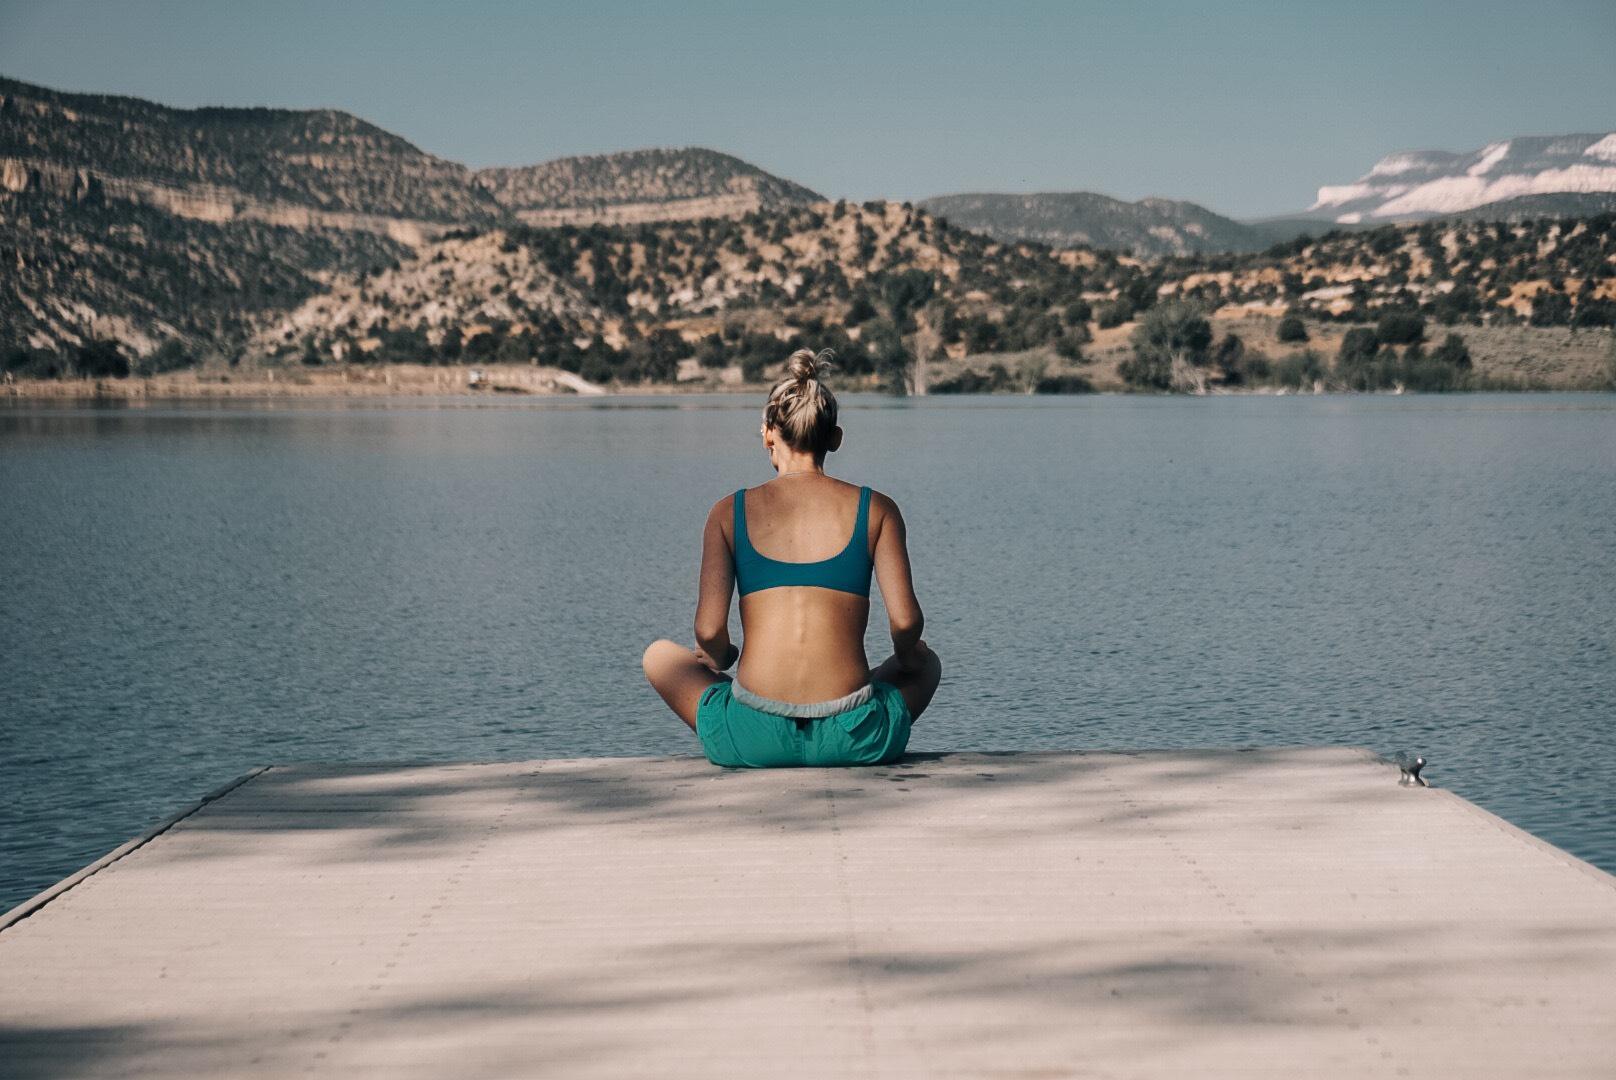 Sarah Dalton  enjoying a quiet morning in Petrified Forest State Park, Utah| Edward Arthur Dalton